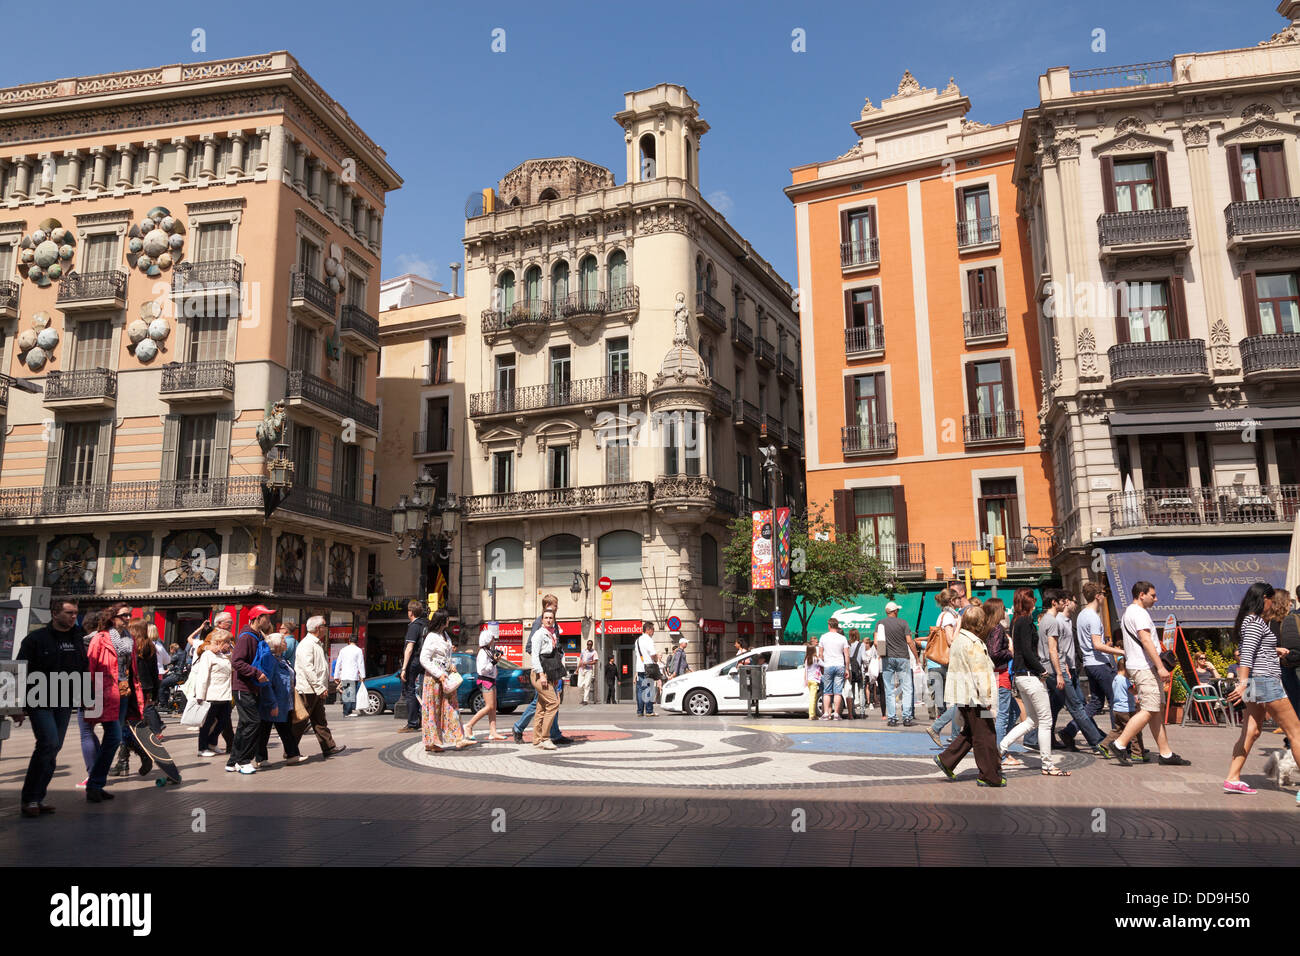 Typical spanish buidings in La Rambla Barcelona - Stock Image